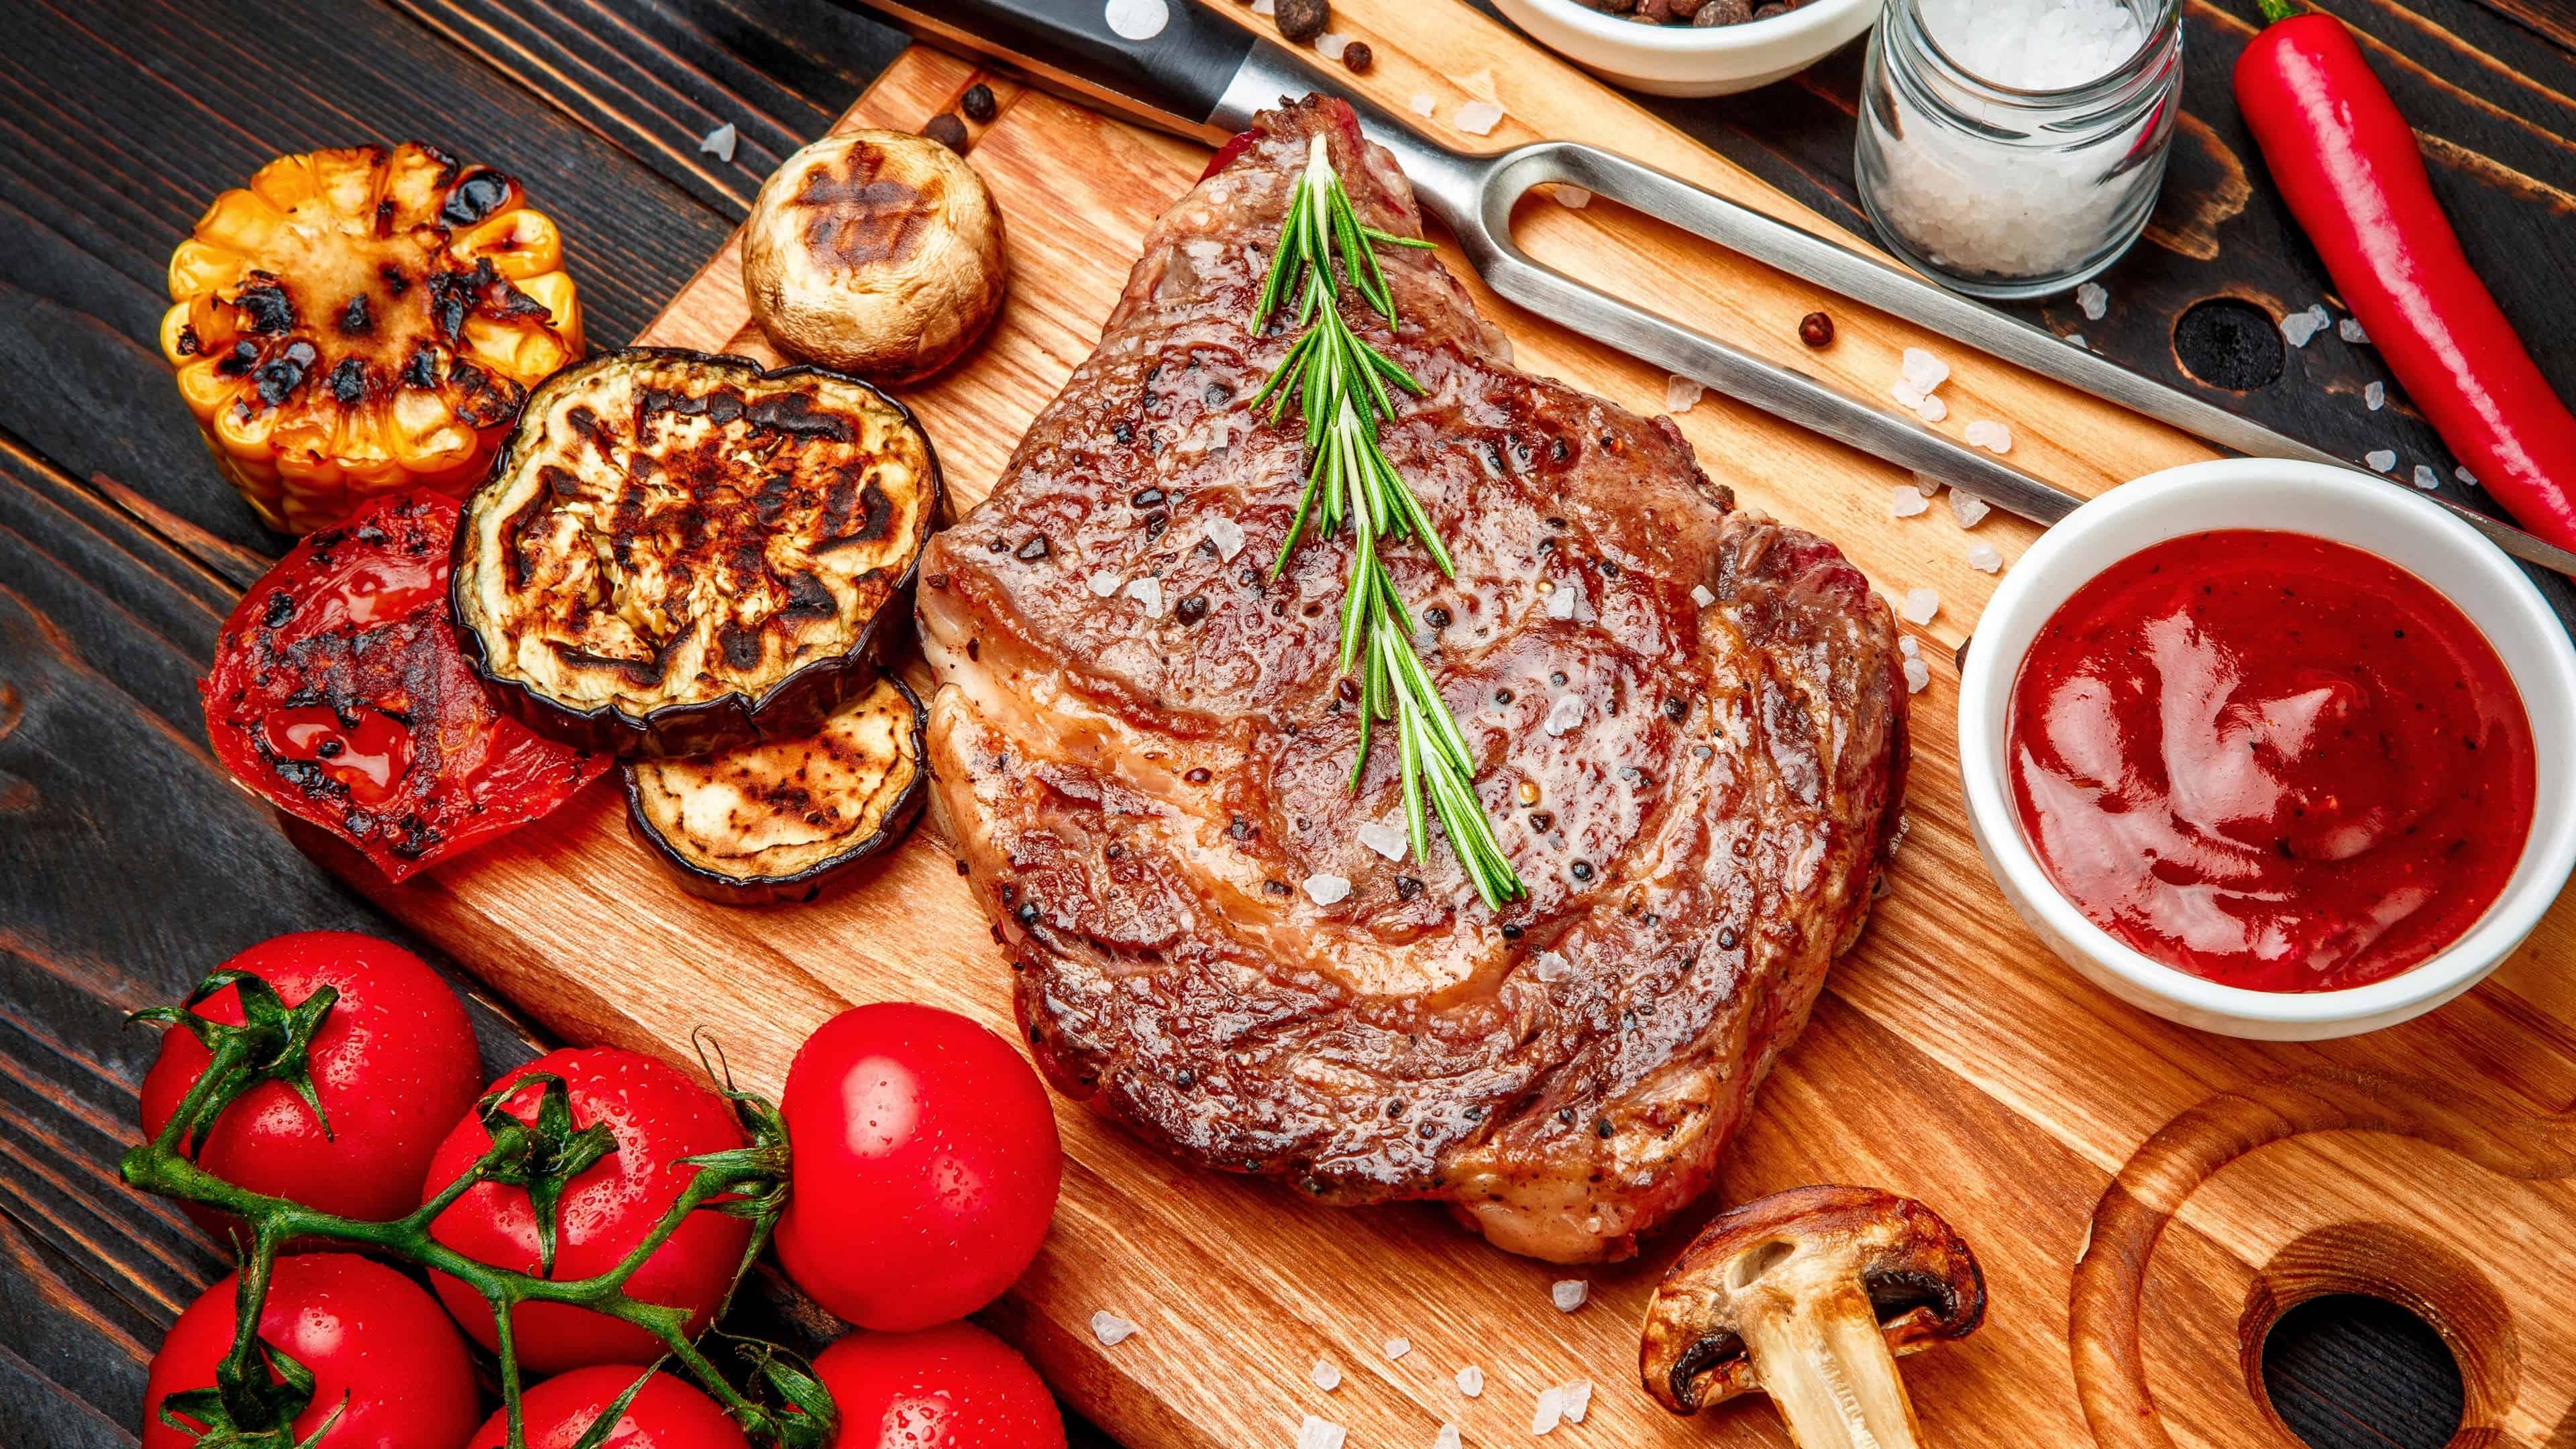 grilled steak uhd 4k wallpaper